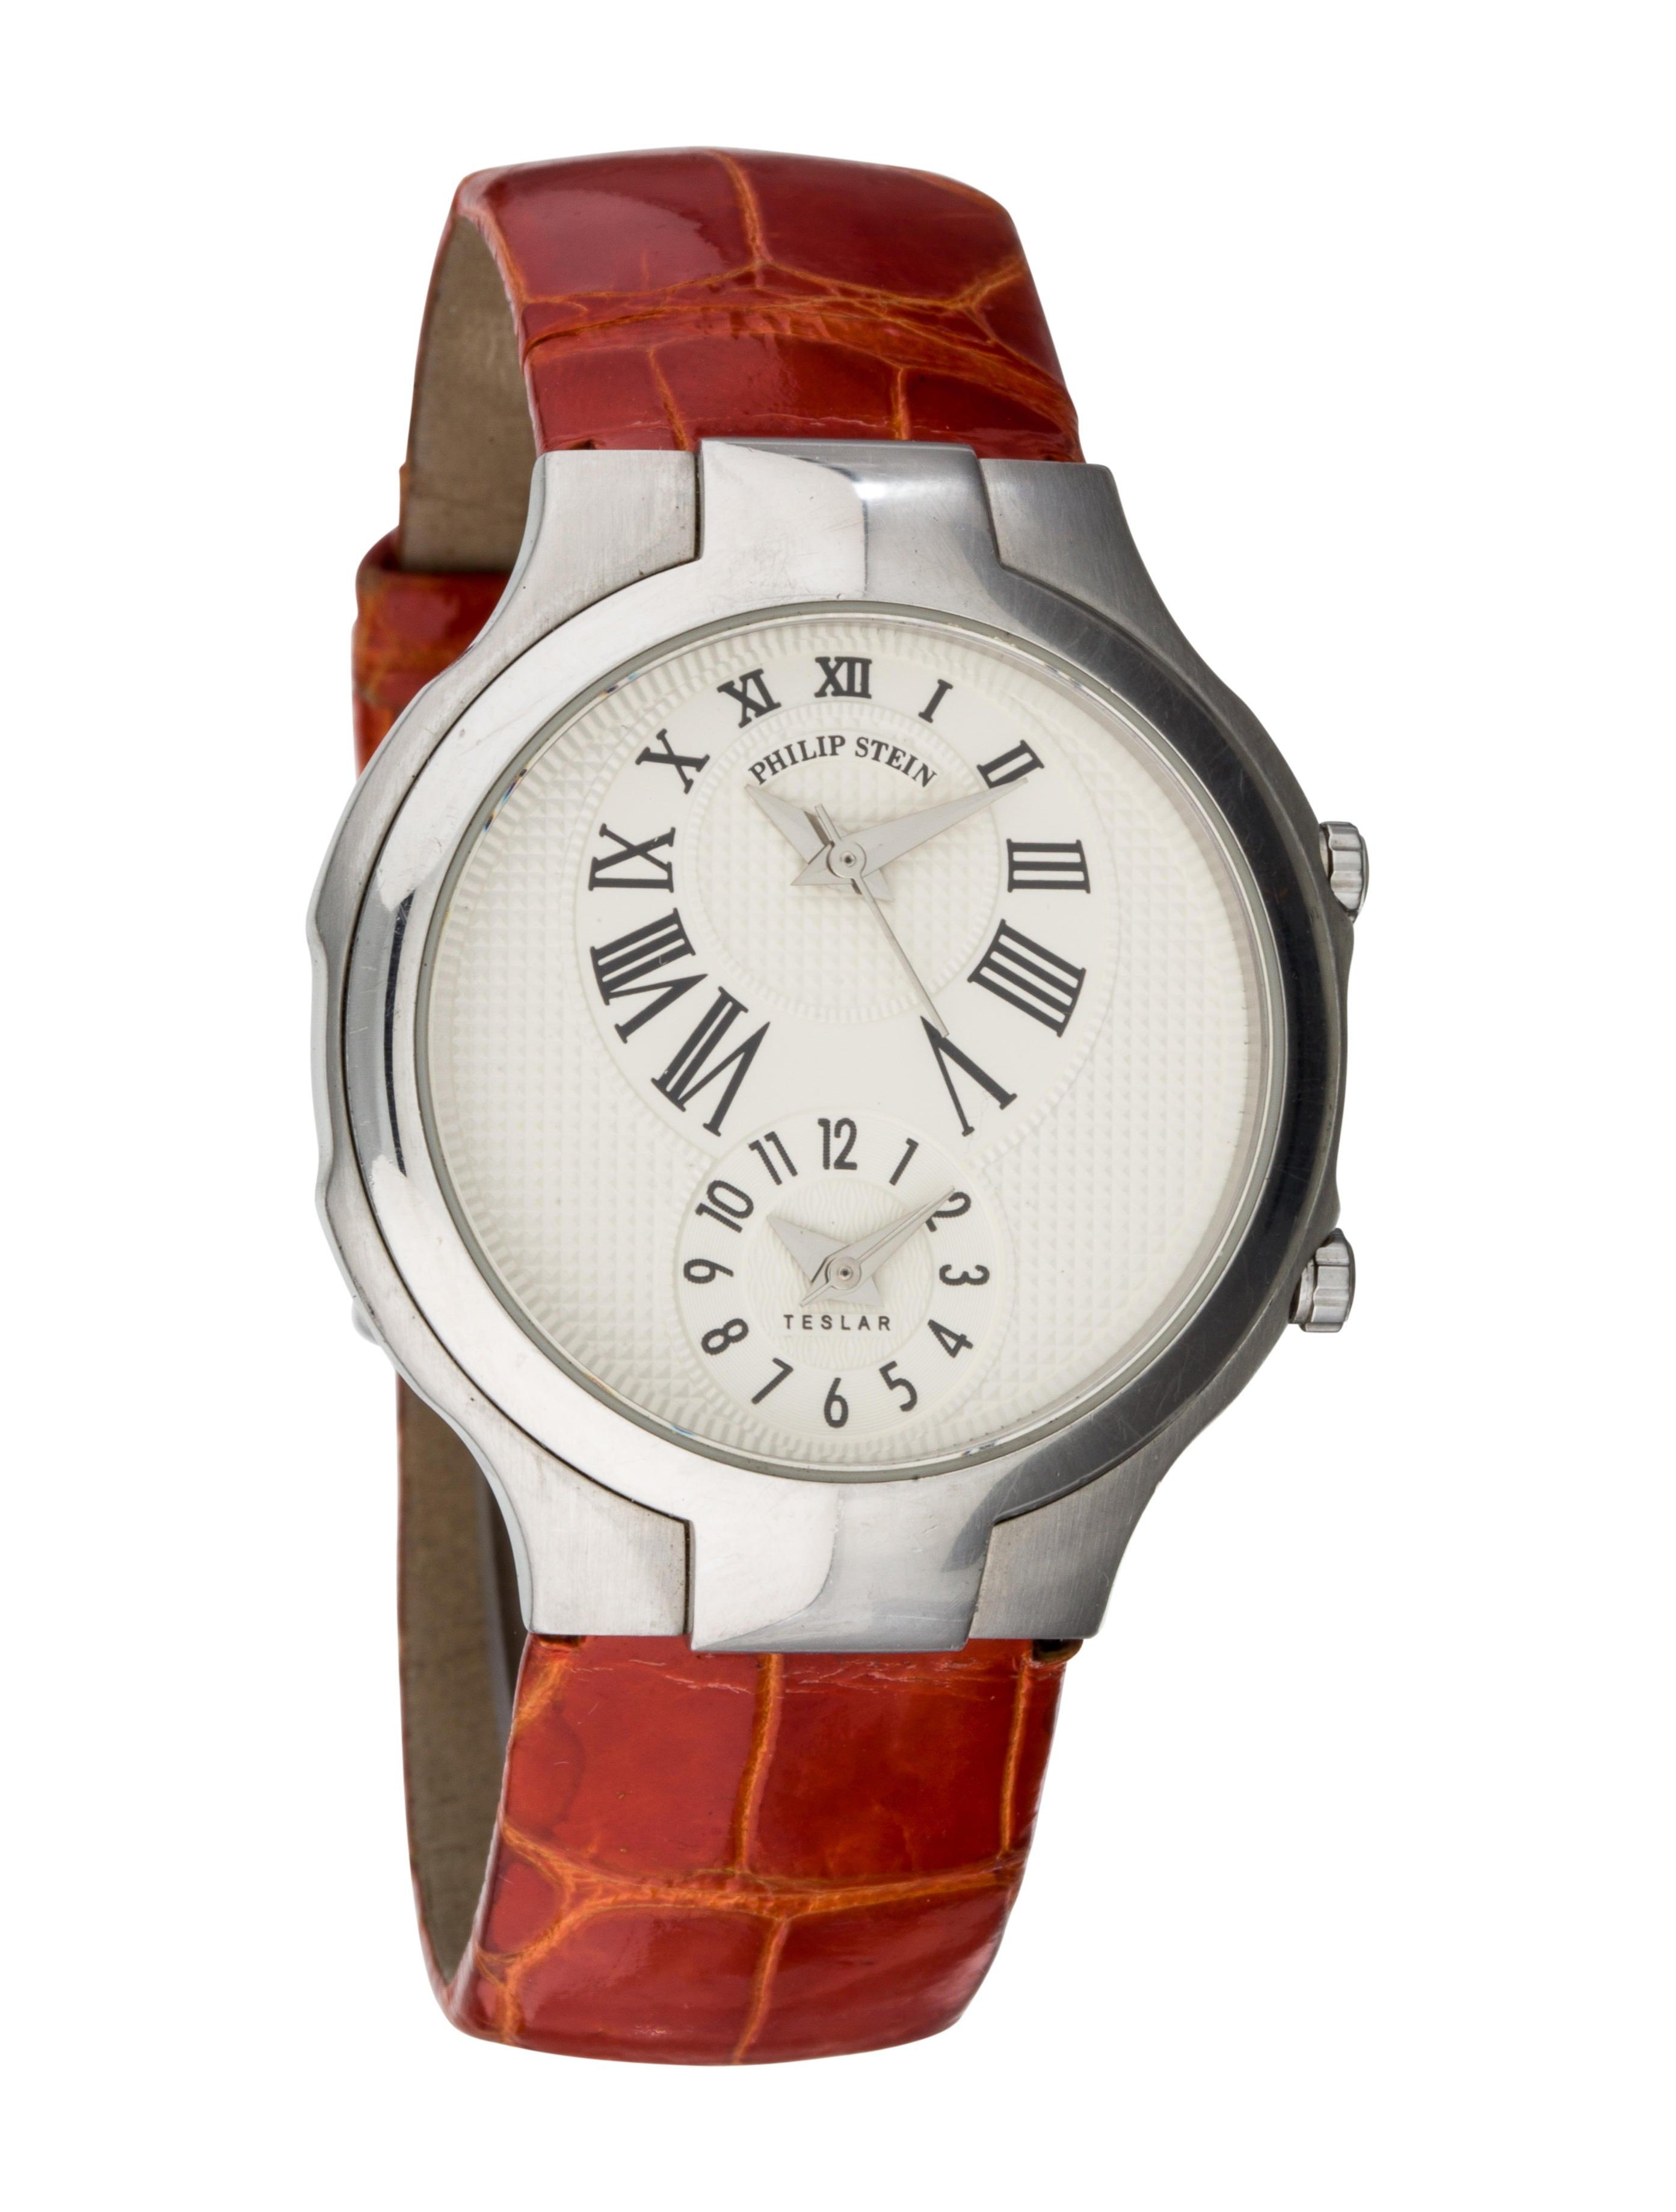 Philip stein teslar chronograph watch strap phs20158 the realreal for Philip stein watches